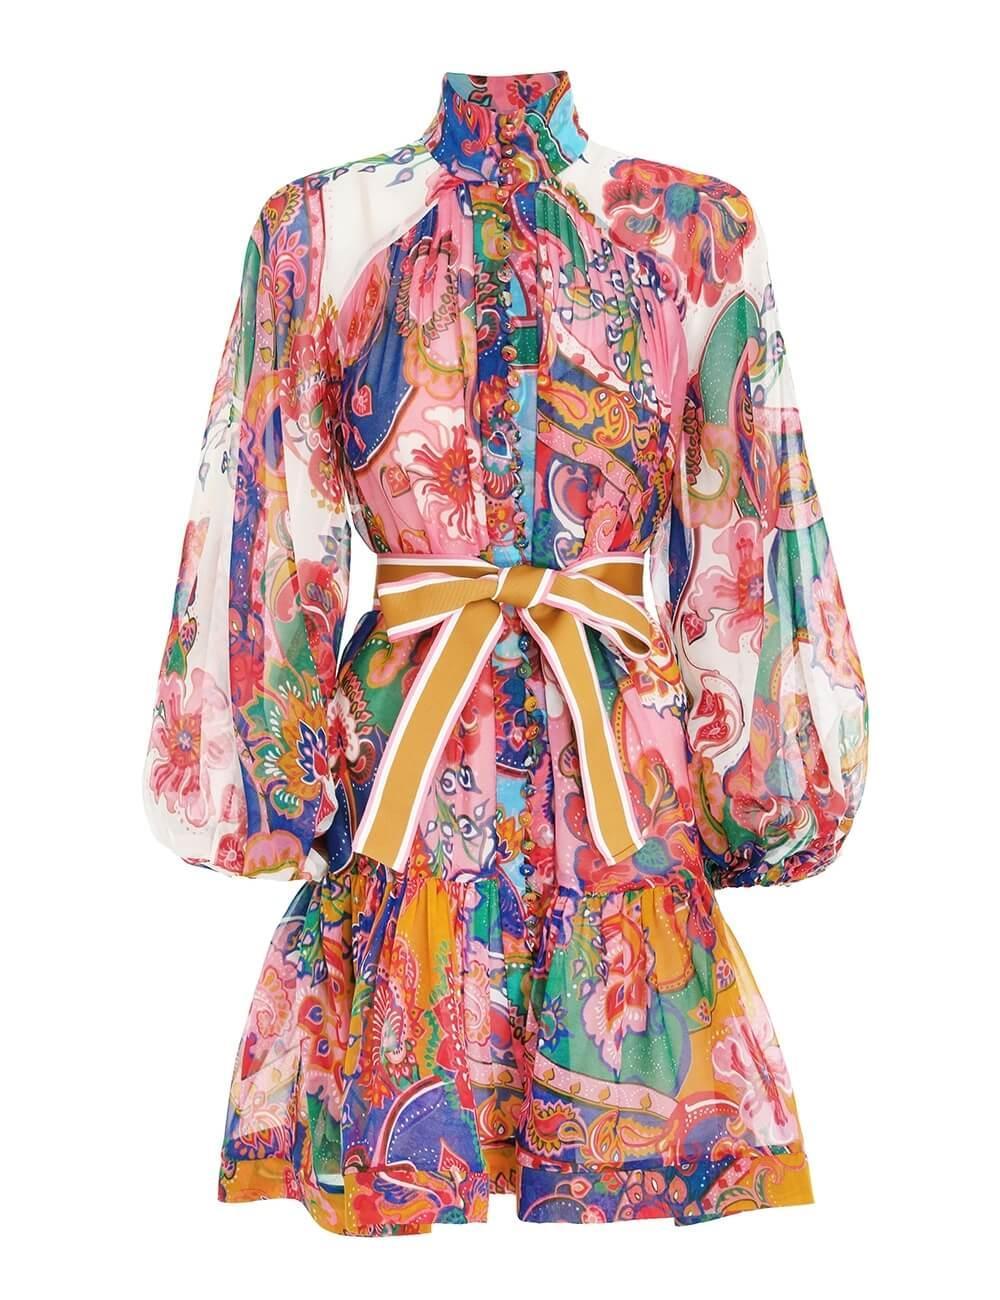 The Lovestruck Belted Mini Dress Item # 9793DAND